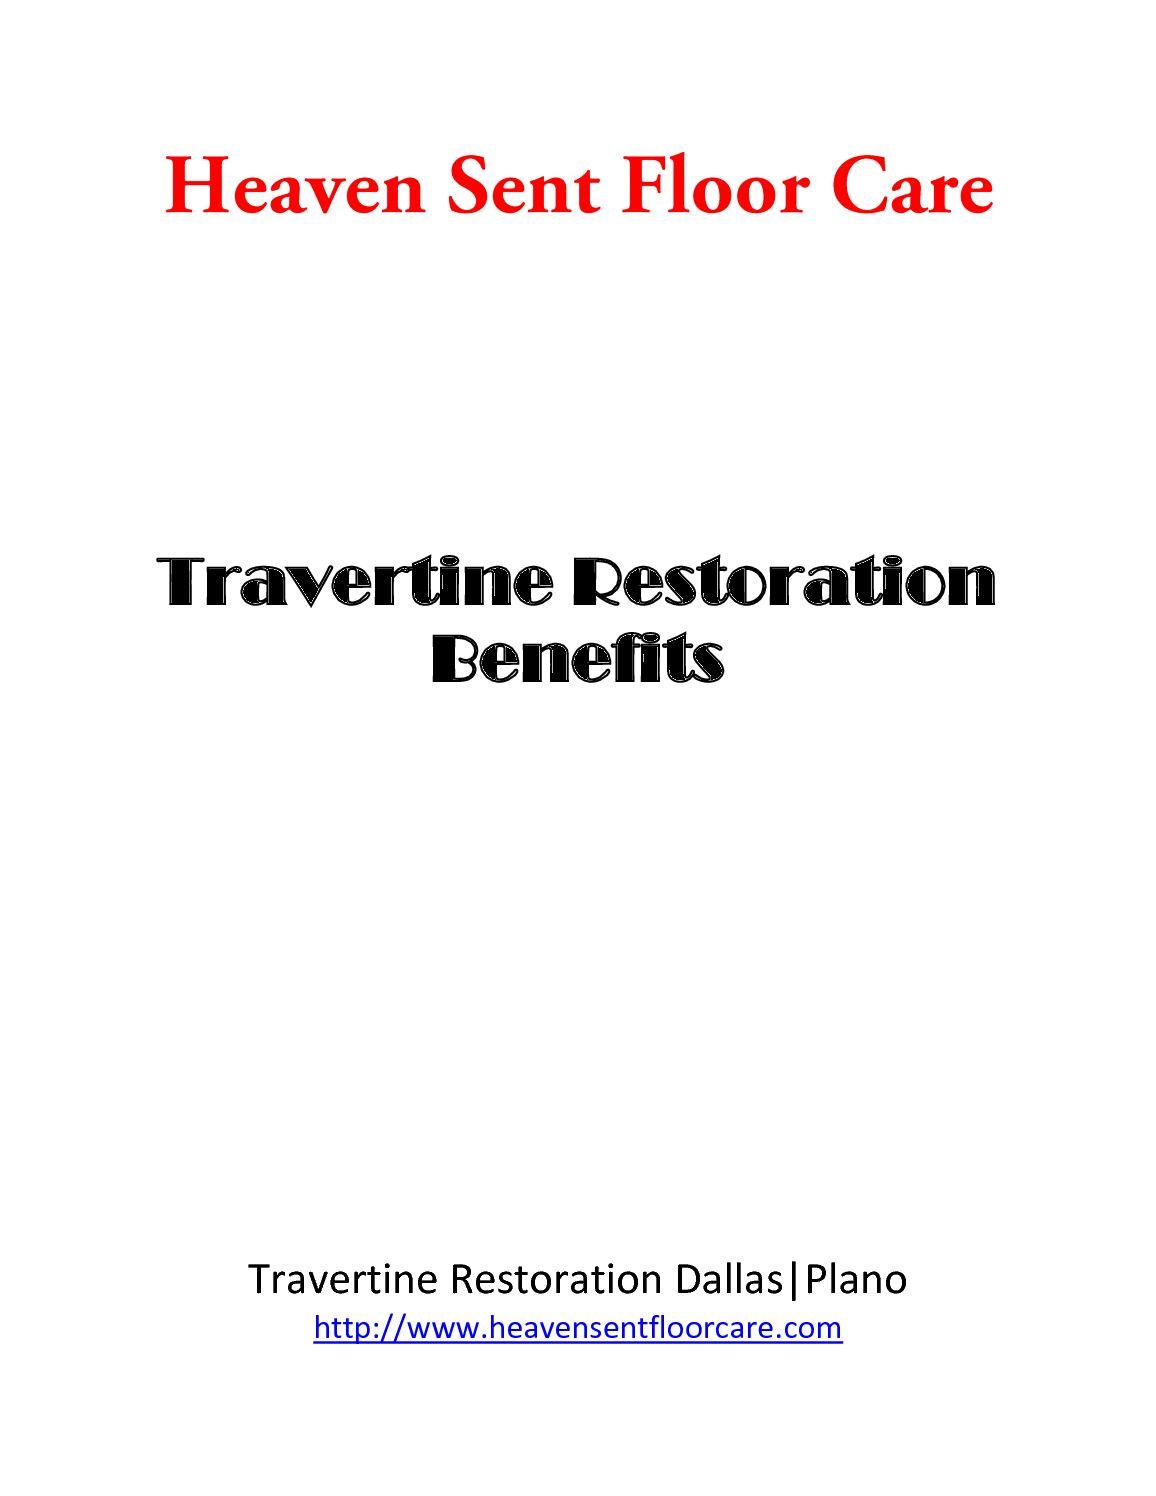 Calaméo - Travertine Restoration Dallas|Plano